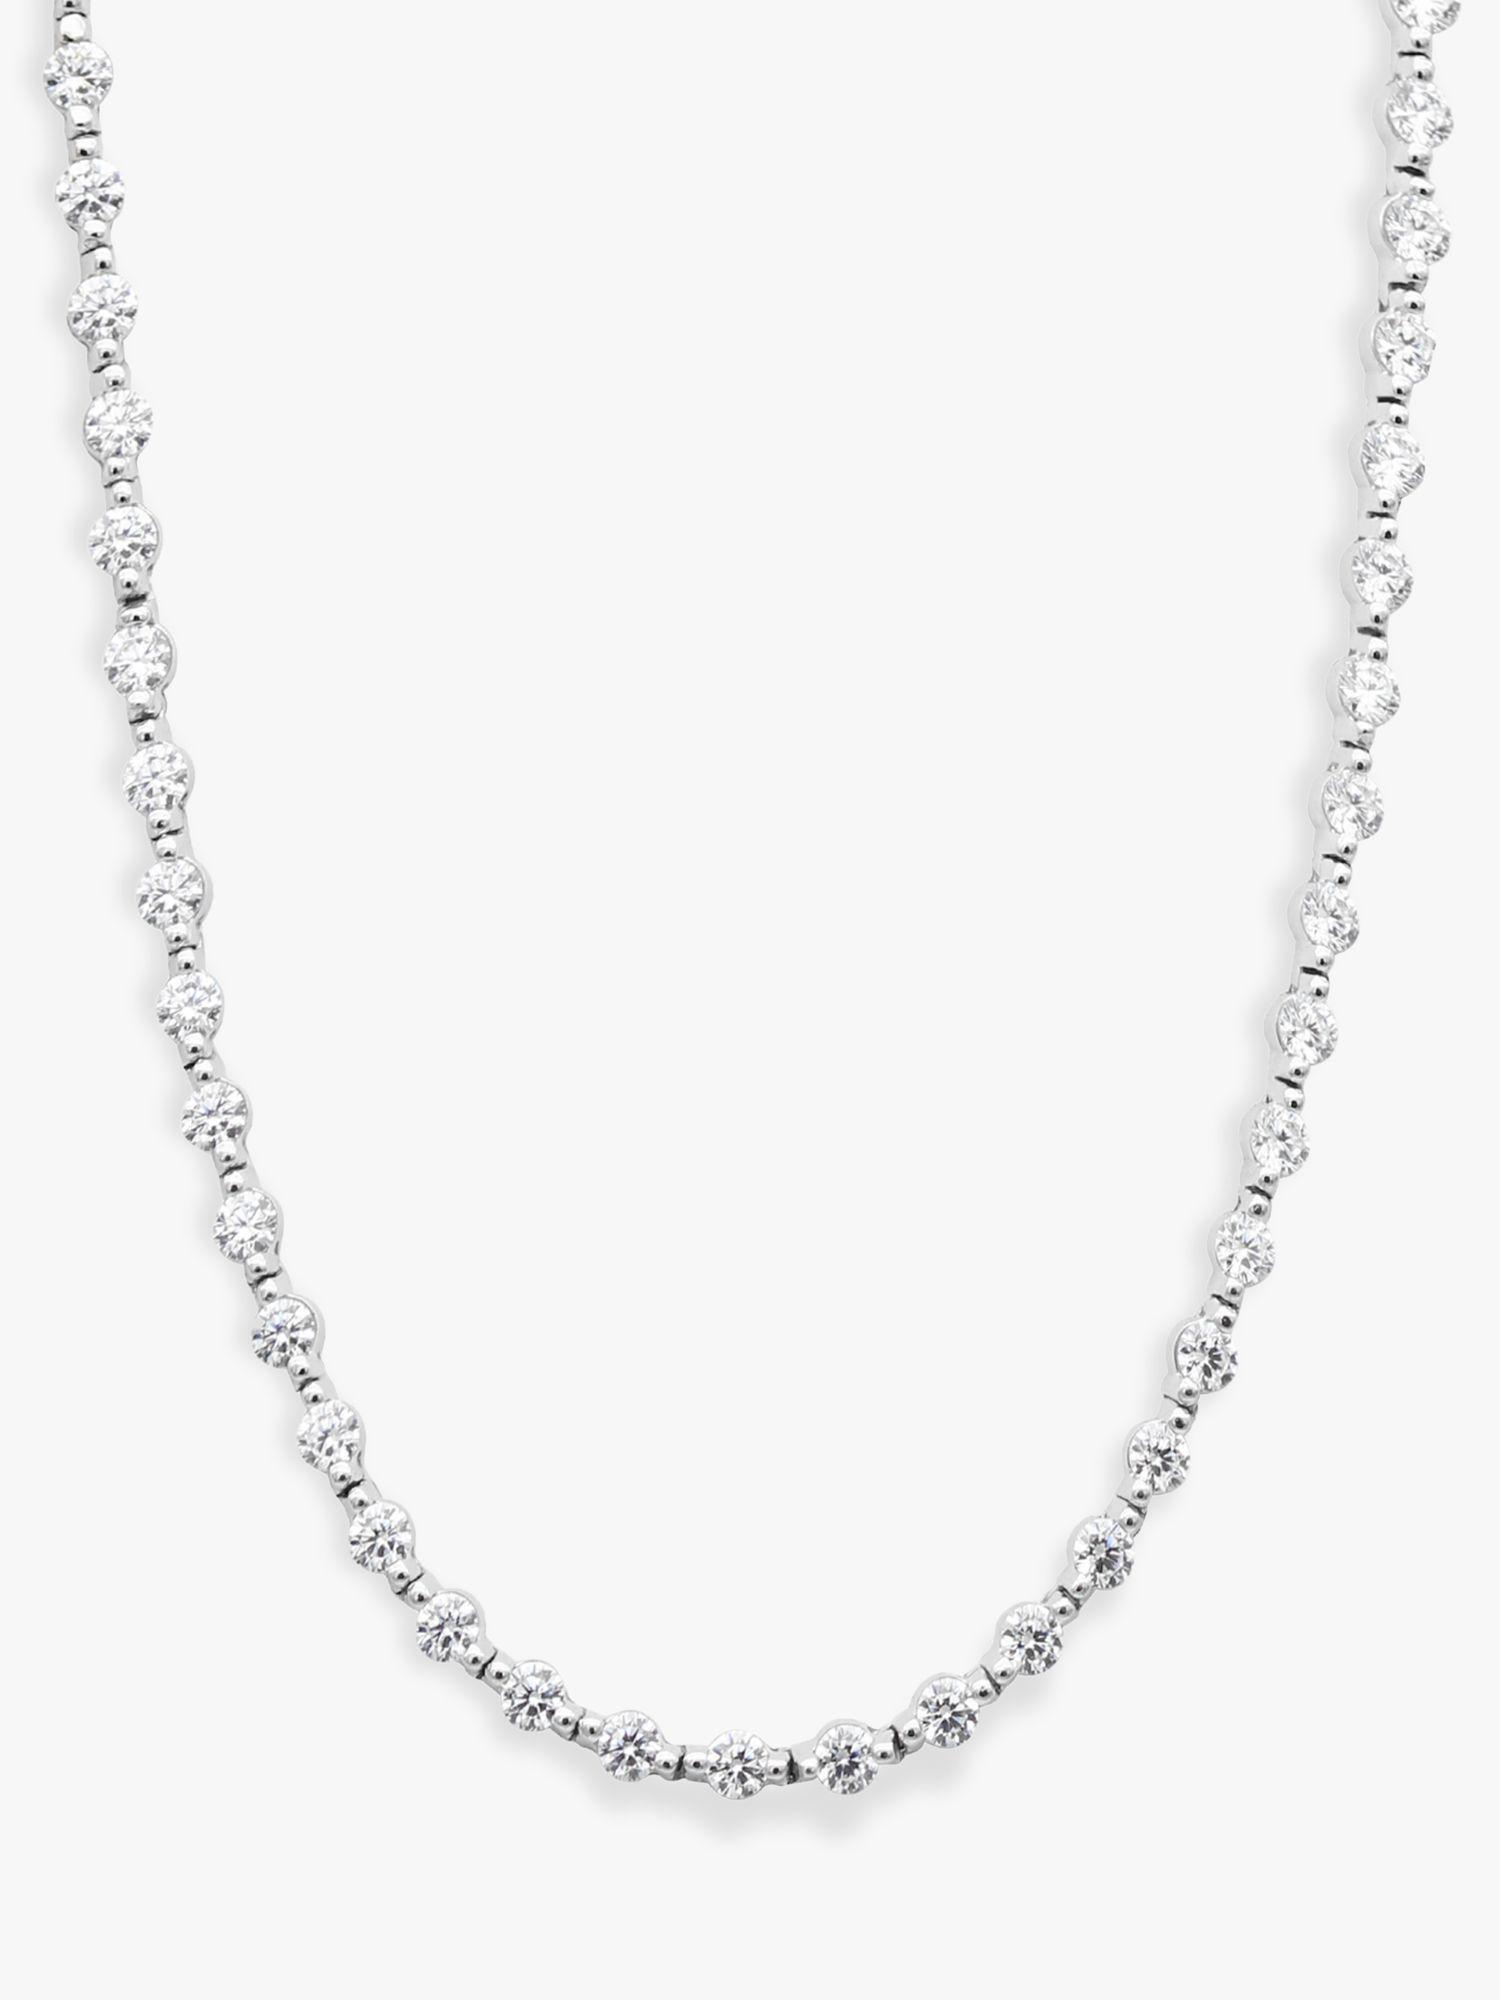 CARAT* London Coralie Round Stone Tennis Chain Necklace